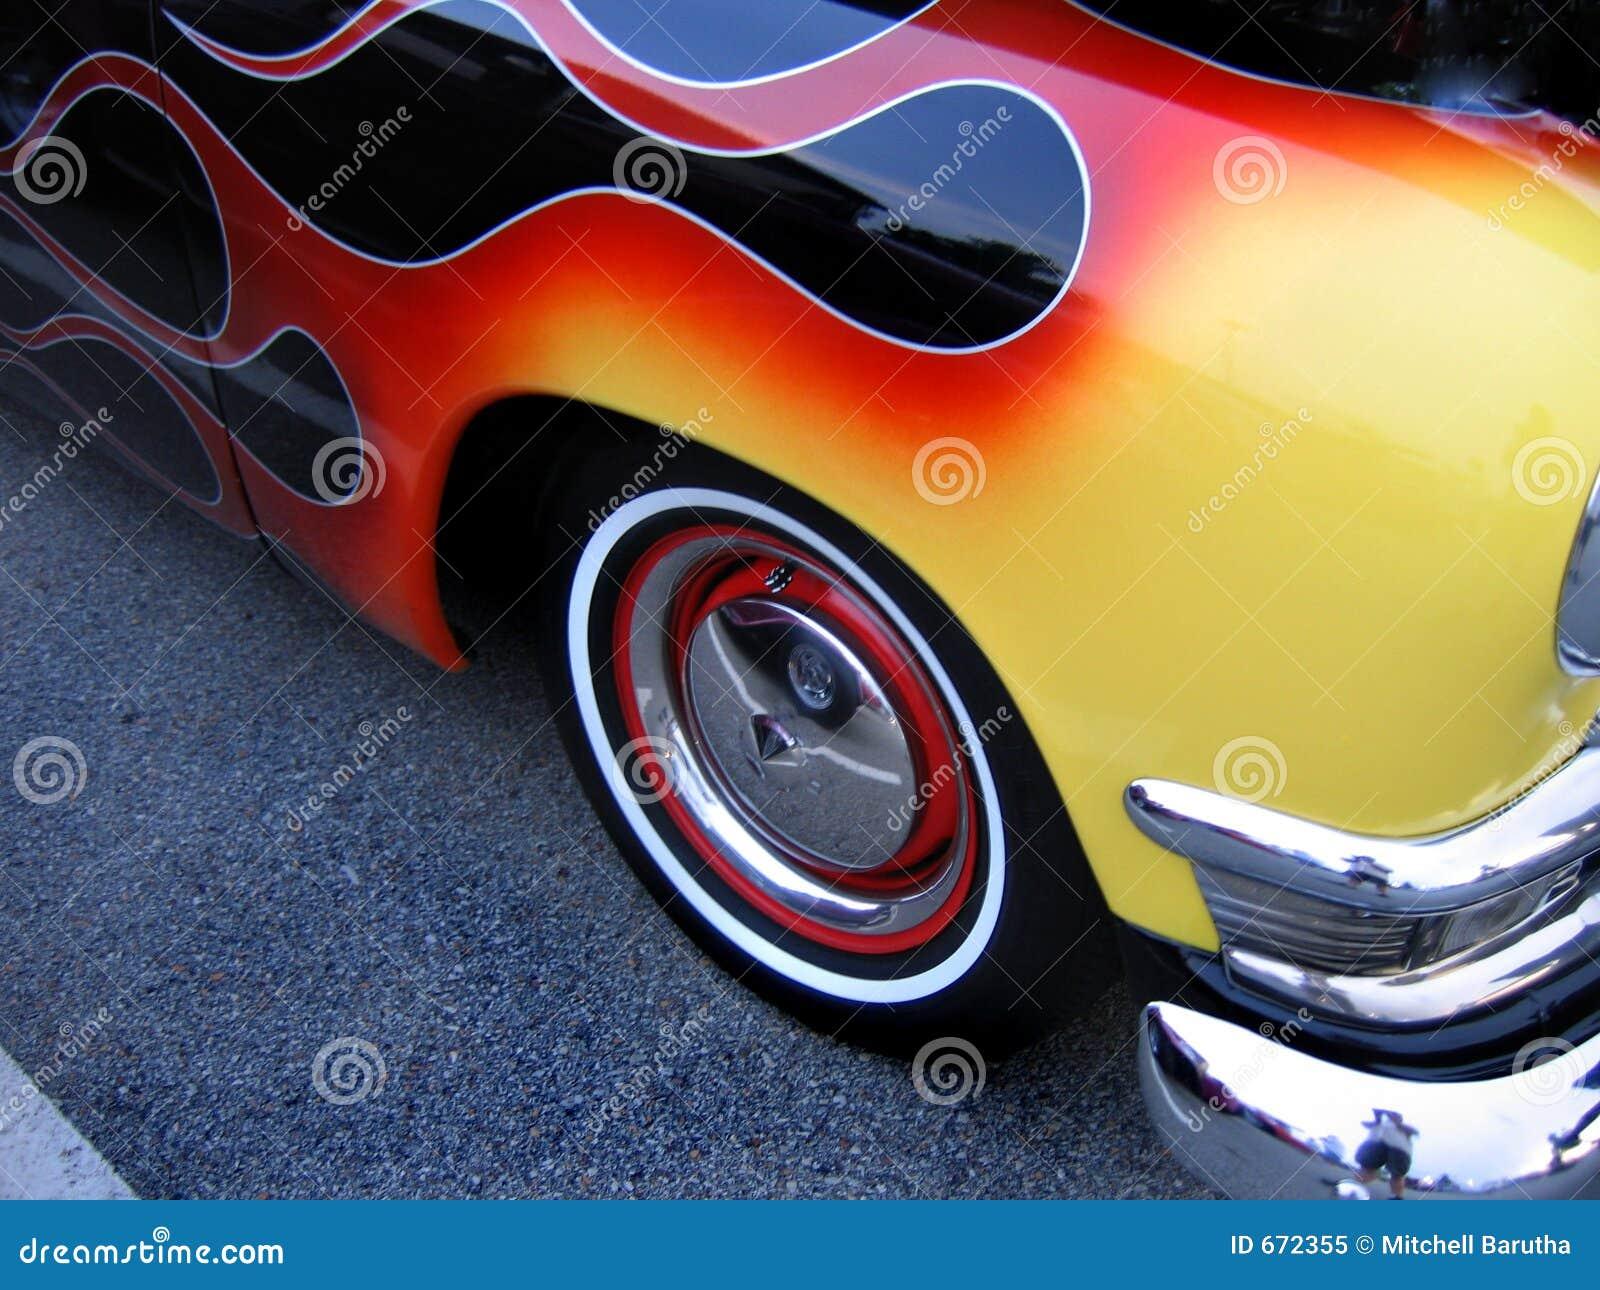 Hot Rod Flames Stock Images - 294 Photos